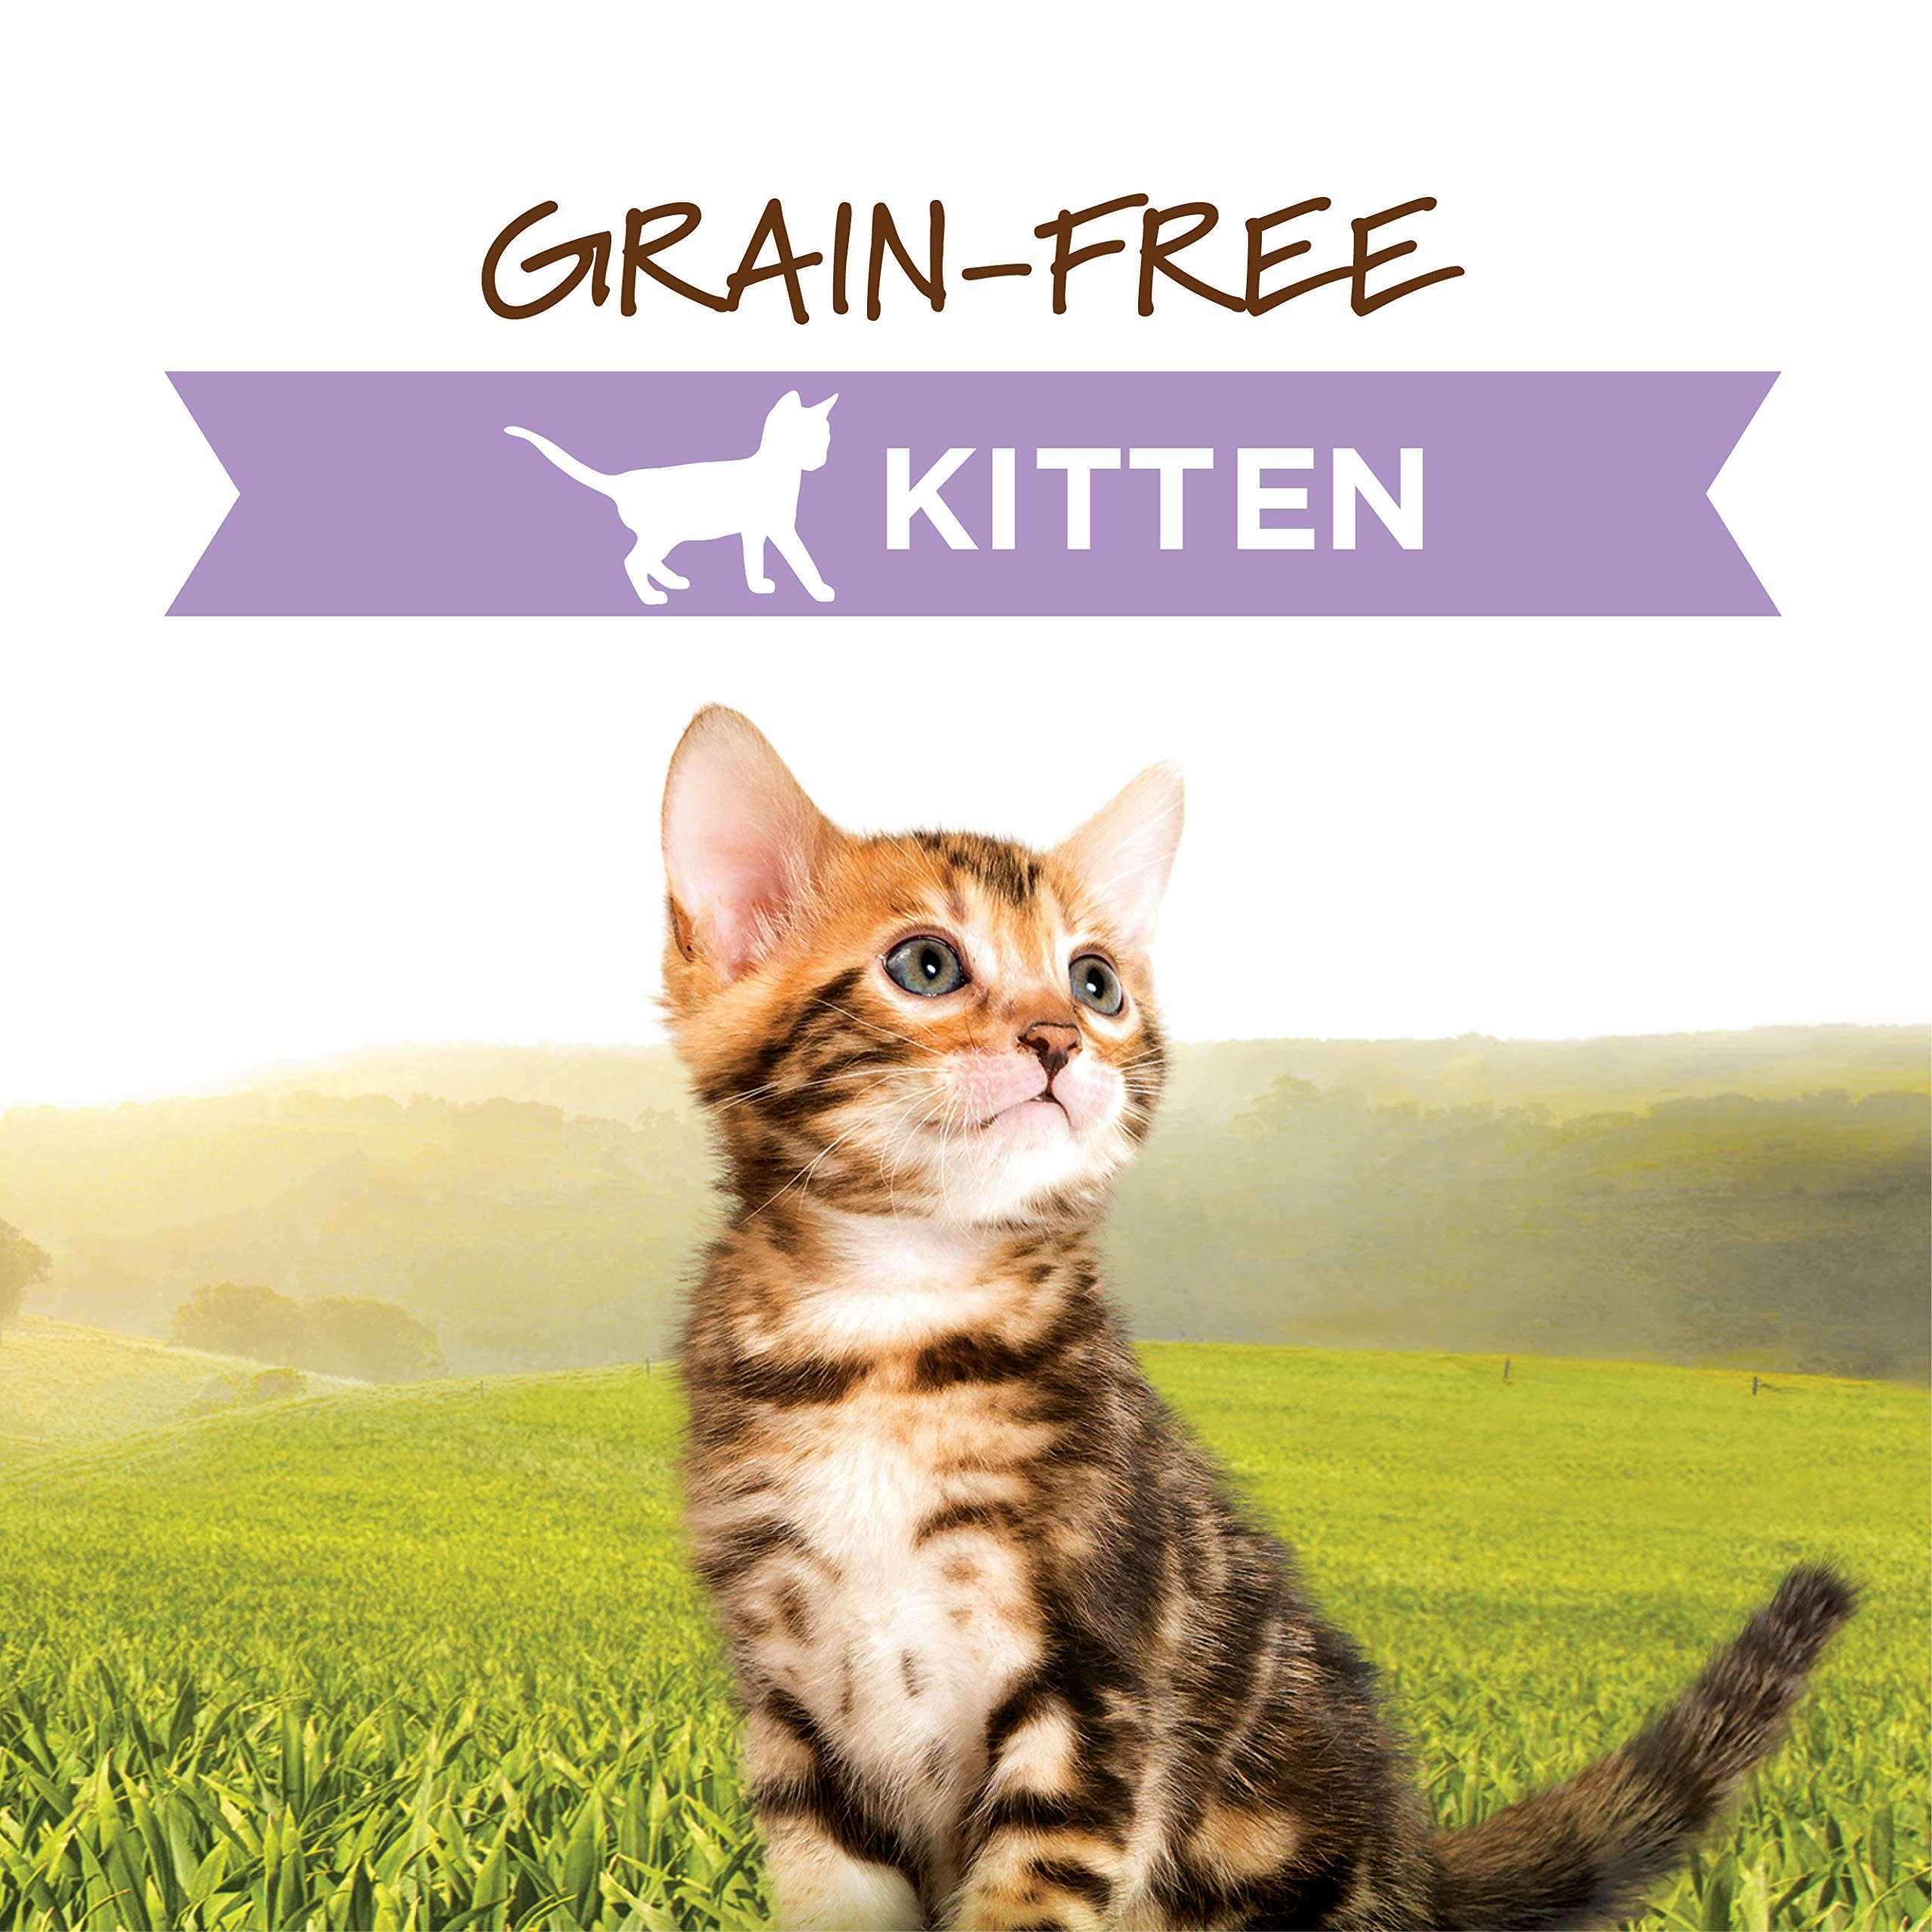 Instinct Original Kitten Grain Free Recipe Natural Cat Food By Nature S Variety Ad Grain Ad Free Kitten Instinct